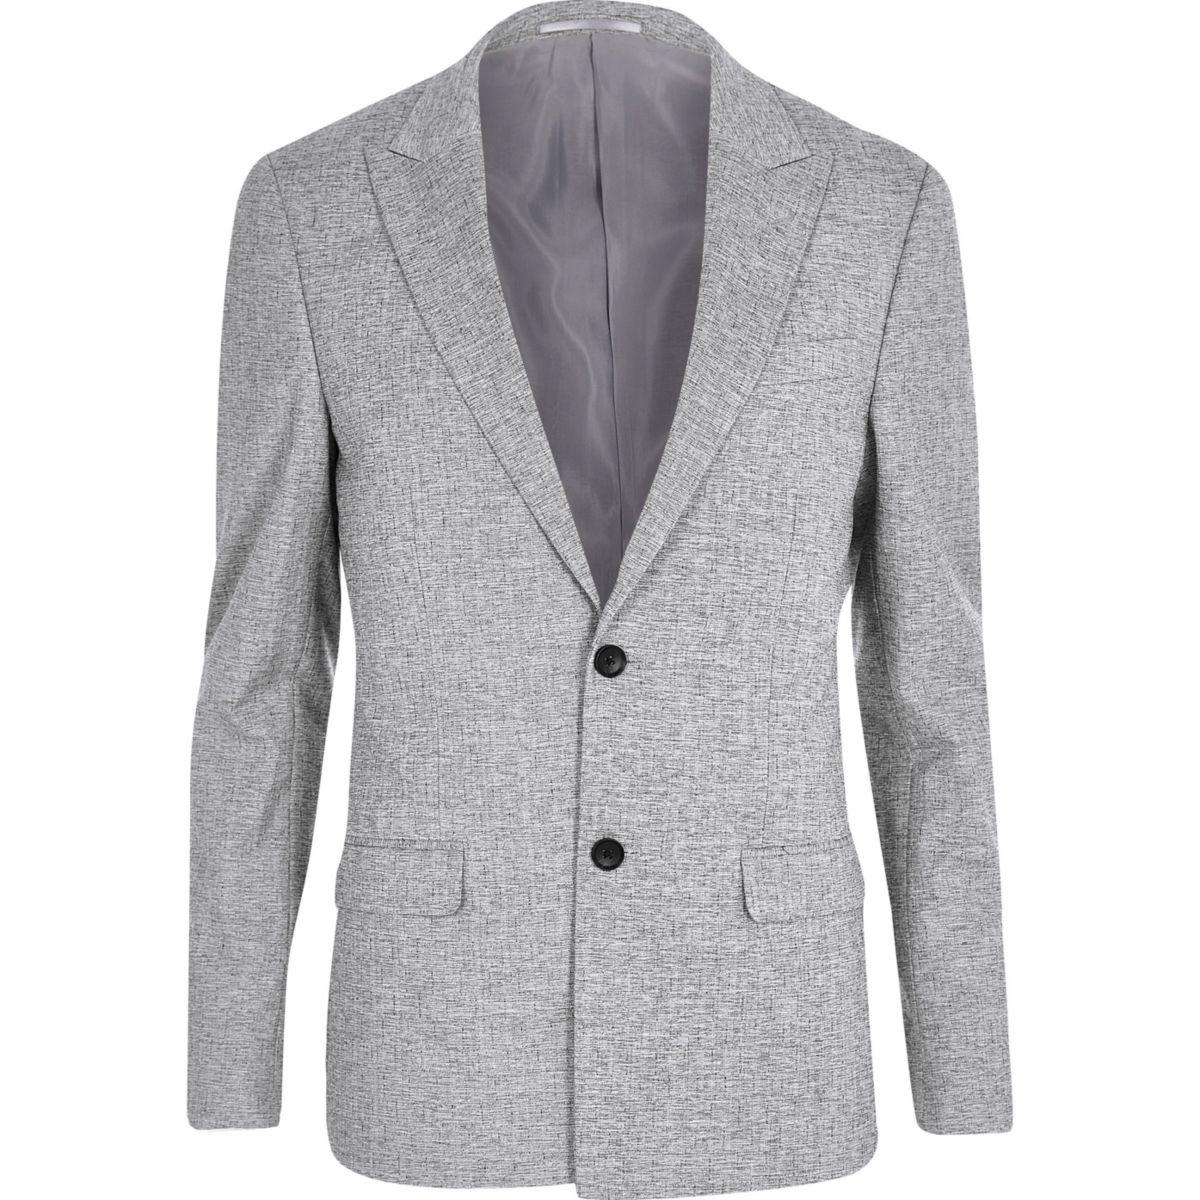 Grey crosshatch skinny fit suit jacket